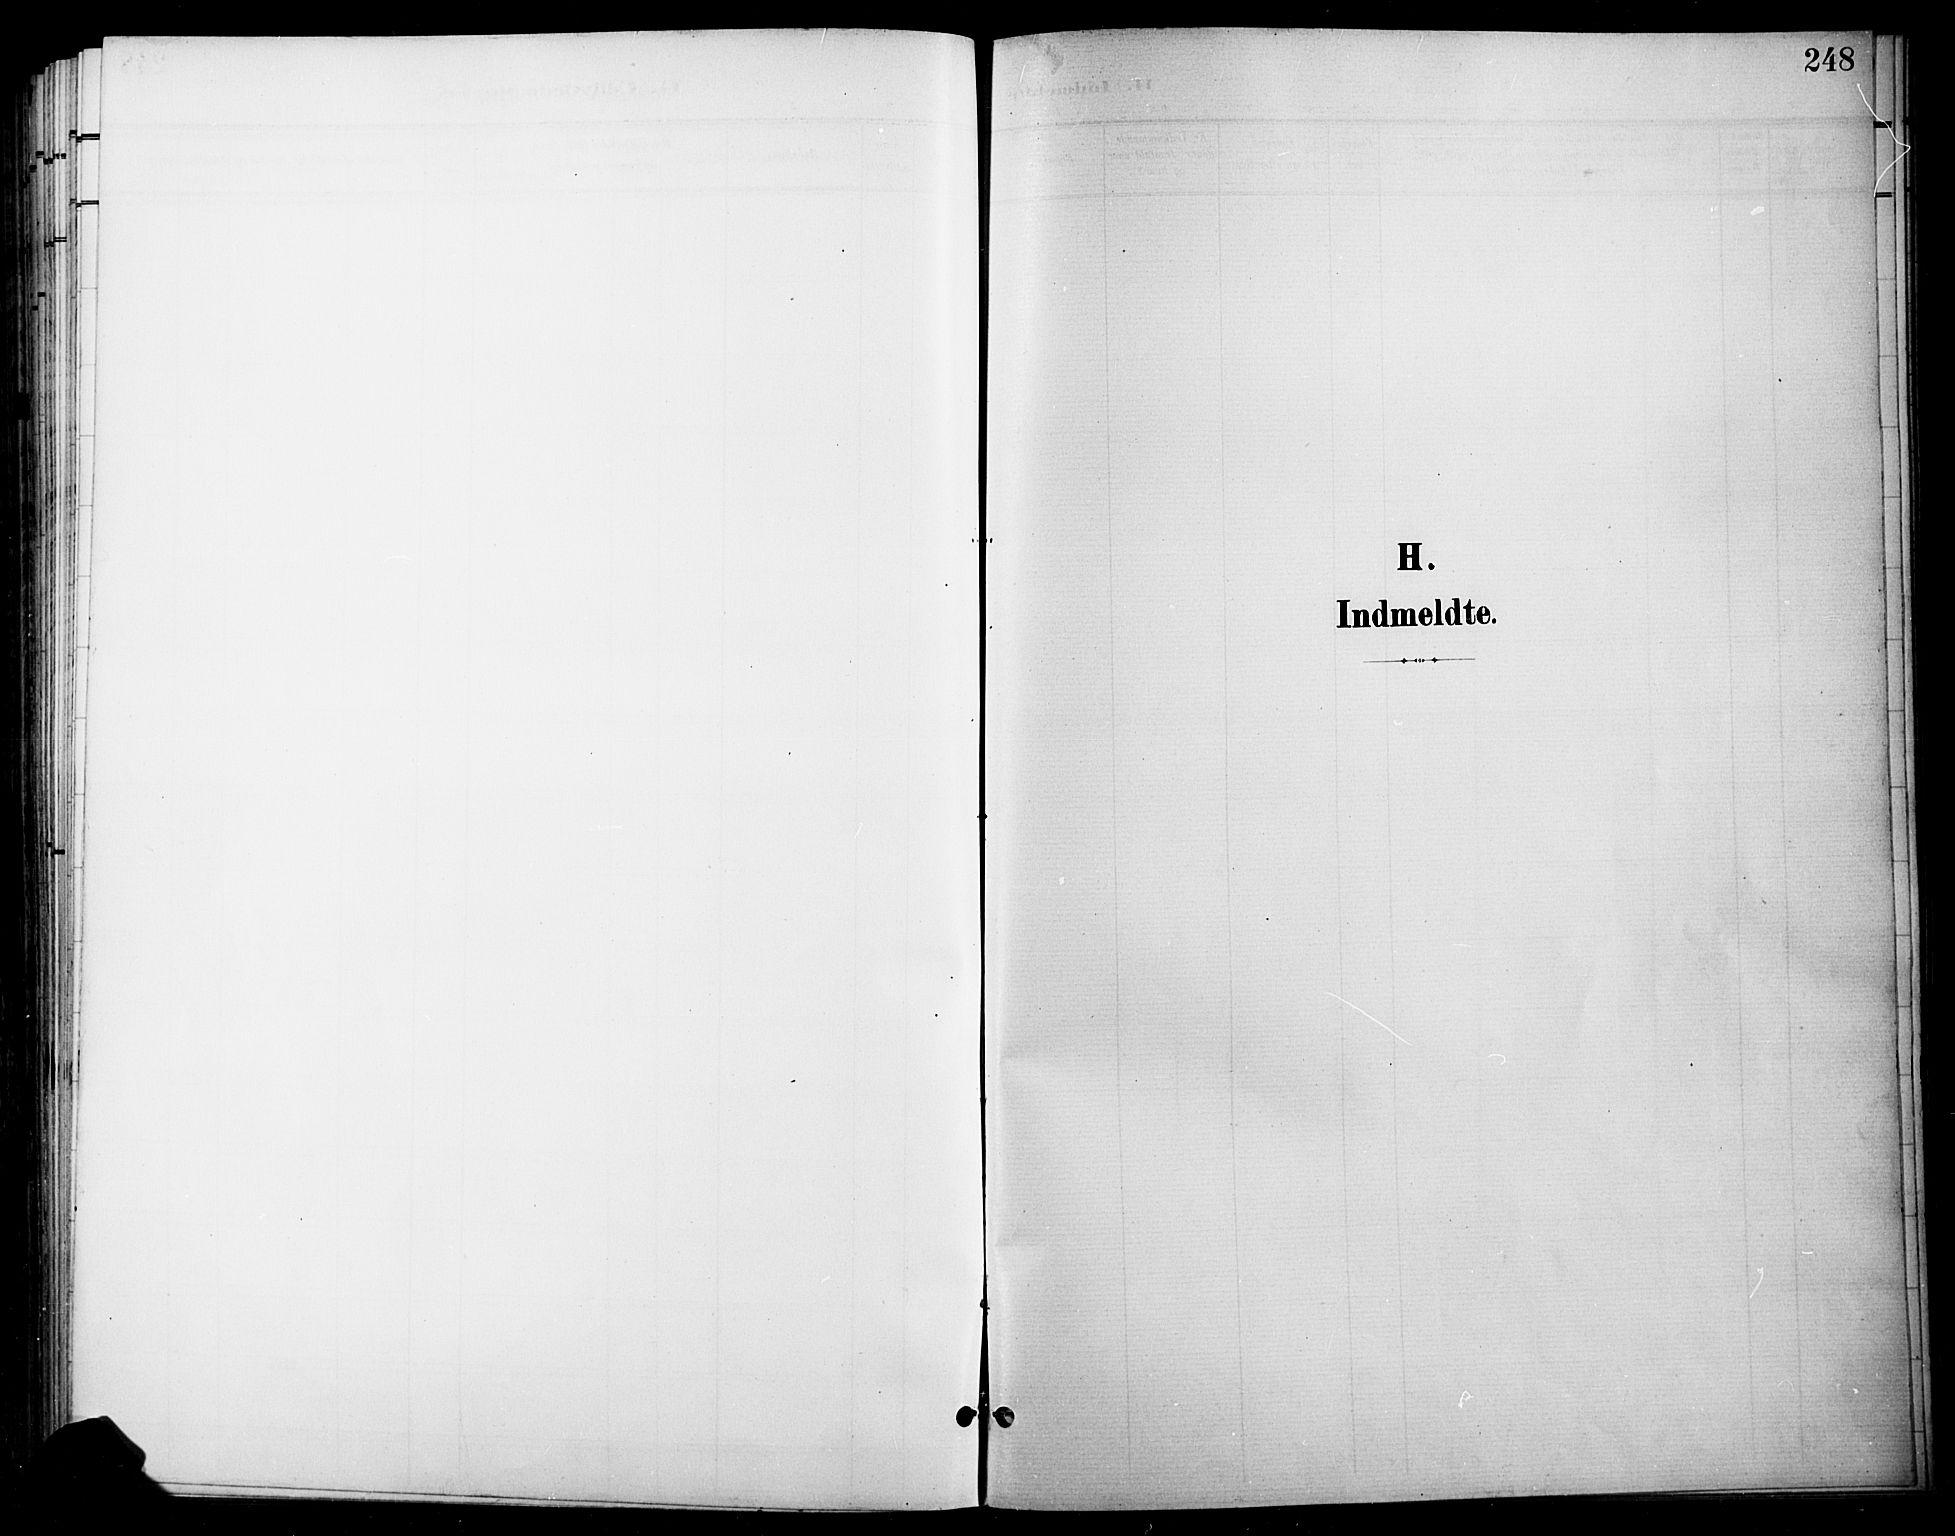 SAH, Gran prestekontor, Ministerialbok nr. 19, 1898-1907, s. 248